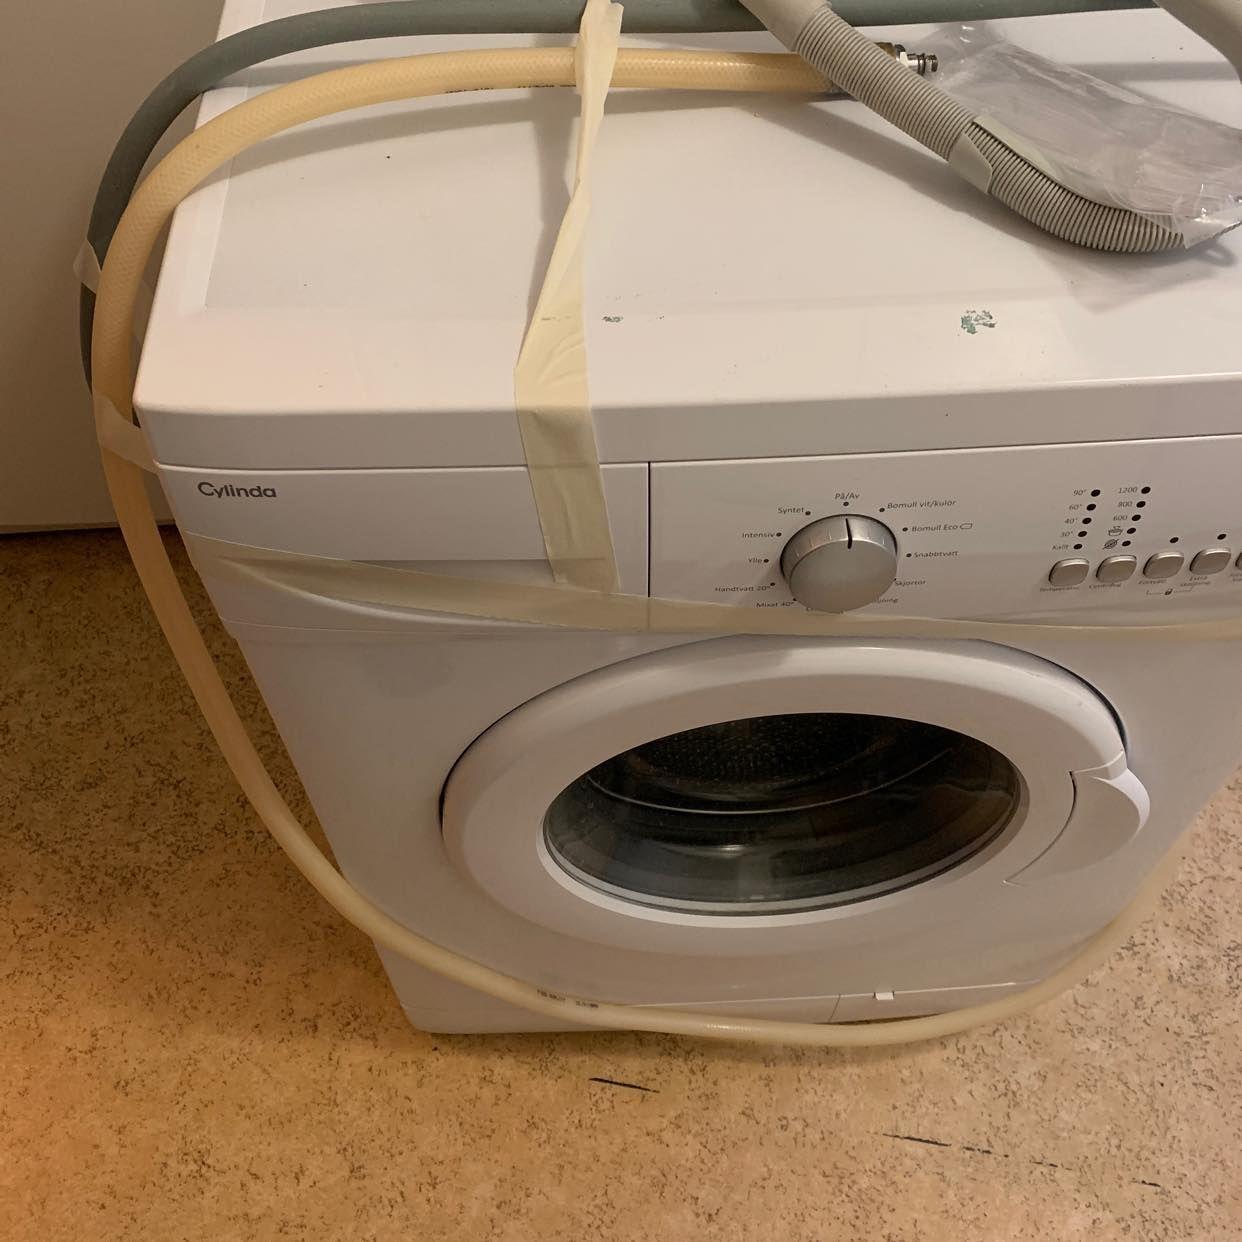 image of Fungerande tvättmaskin - Bandhagen